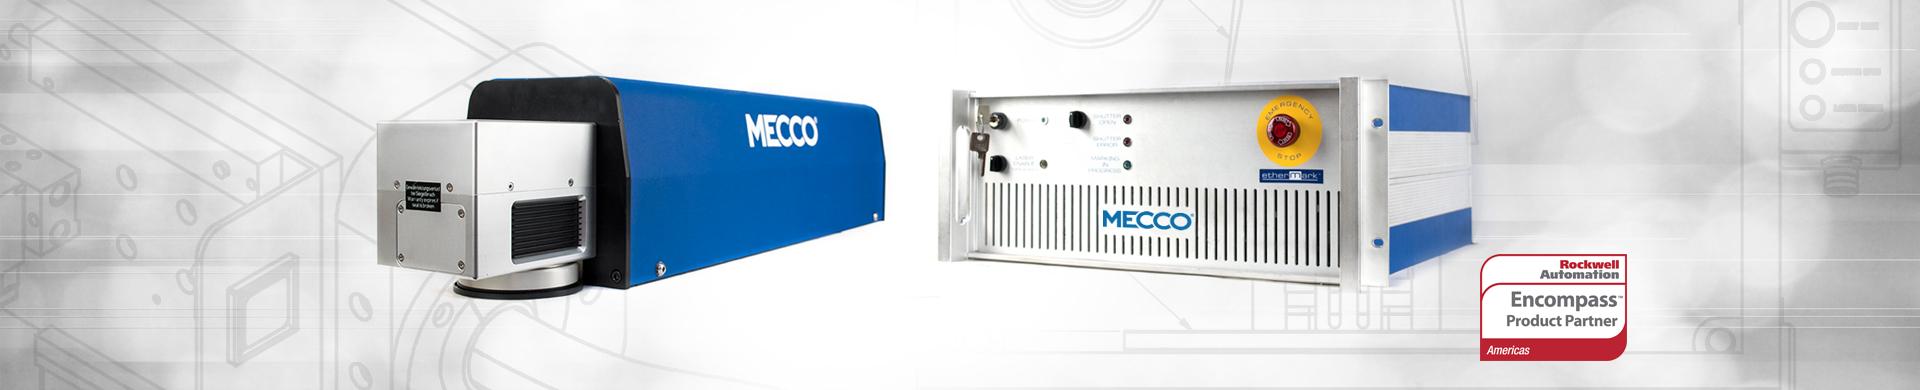 MECCOmark CO2 Laser Marking Machine   MECCO